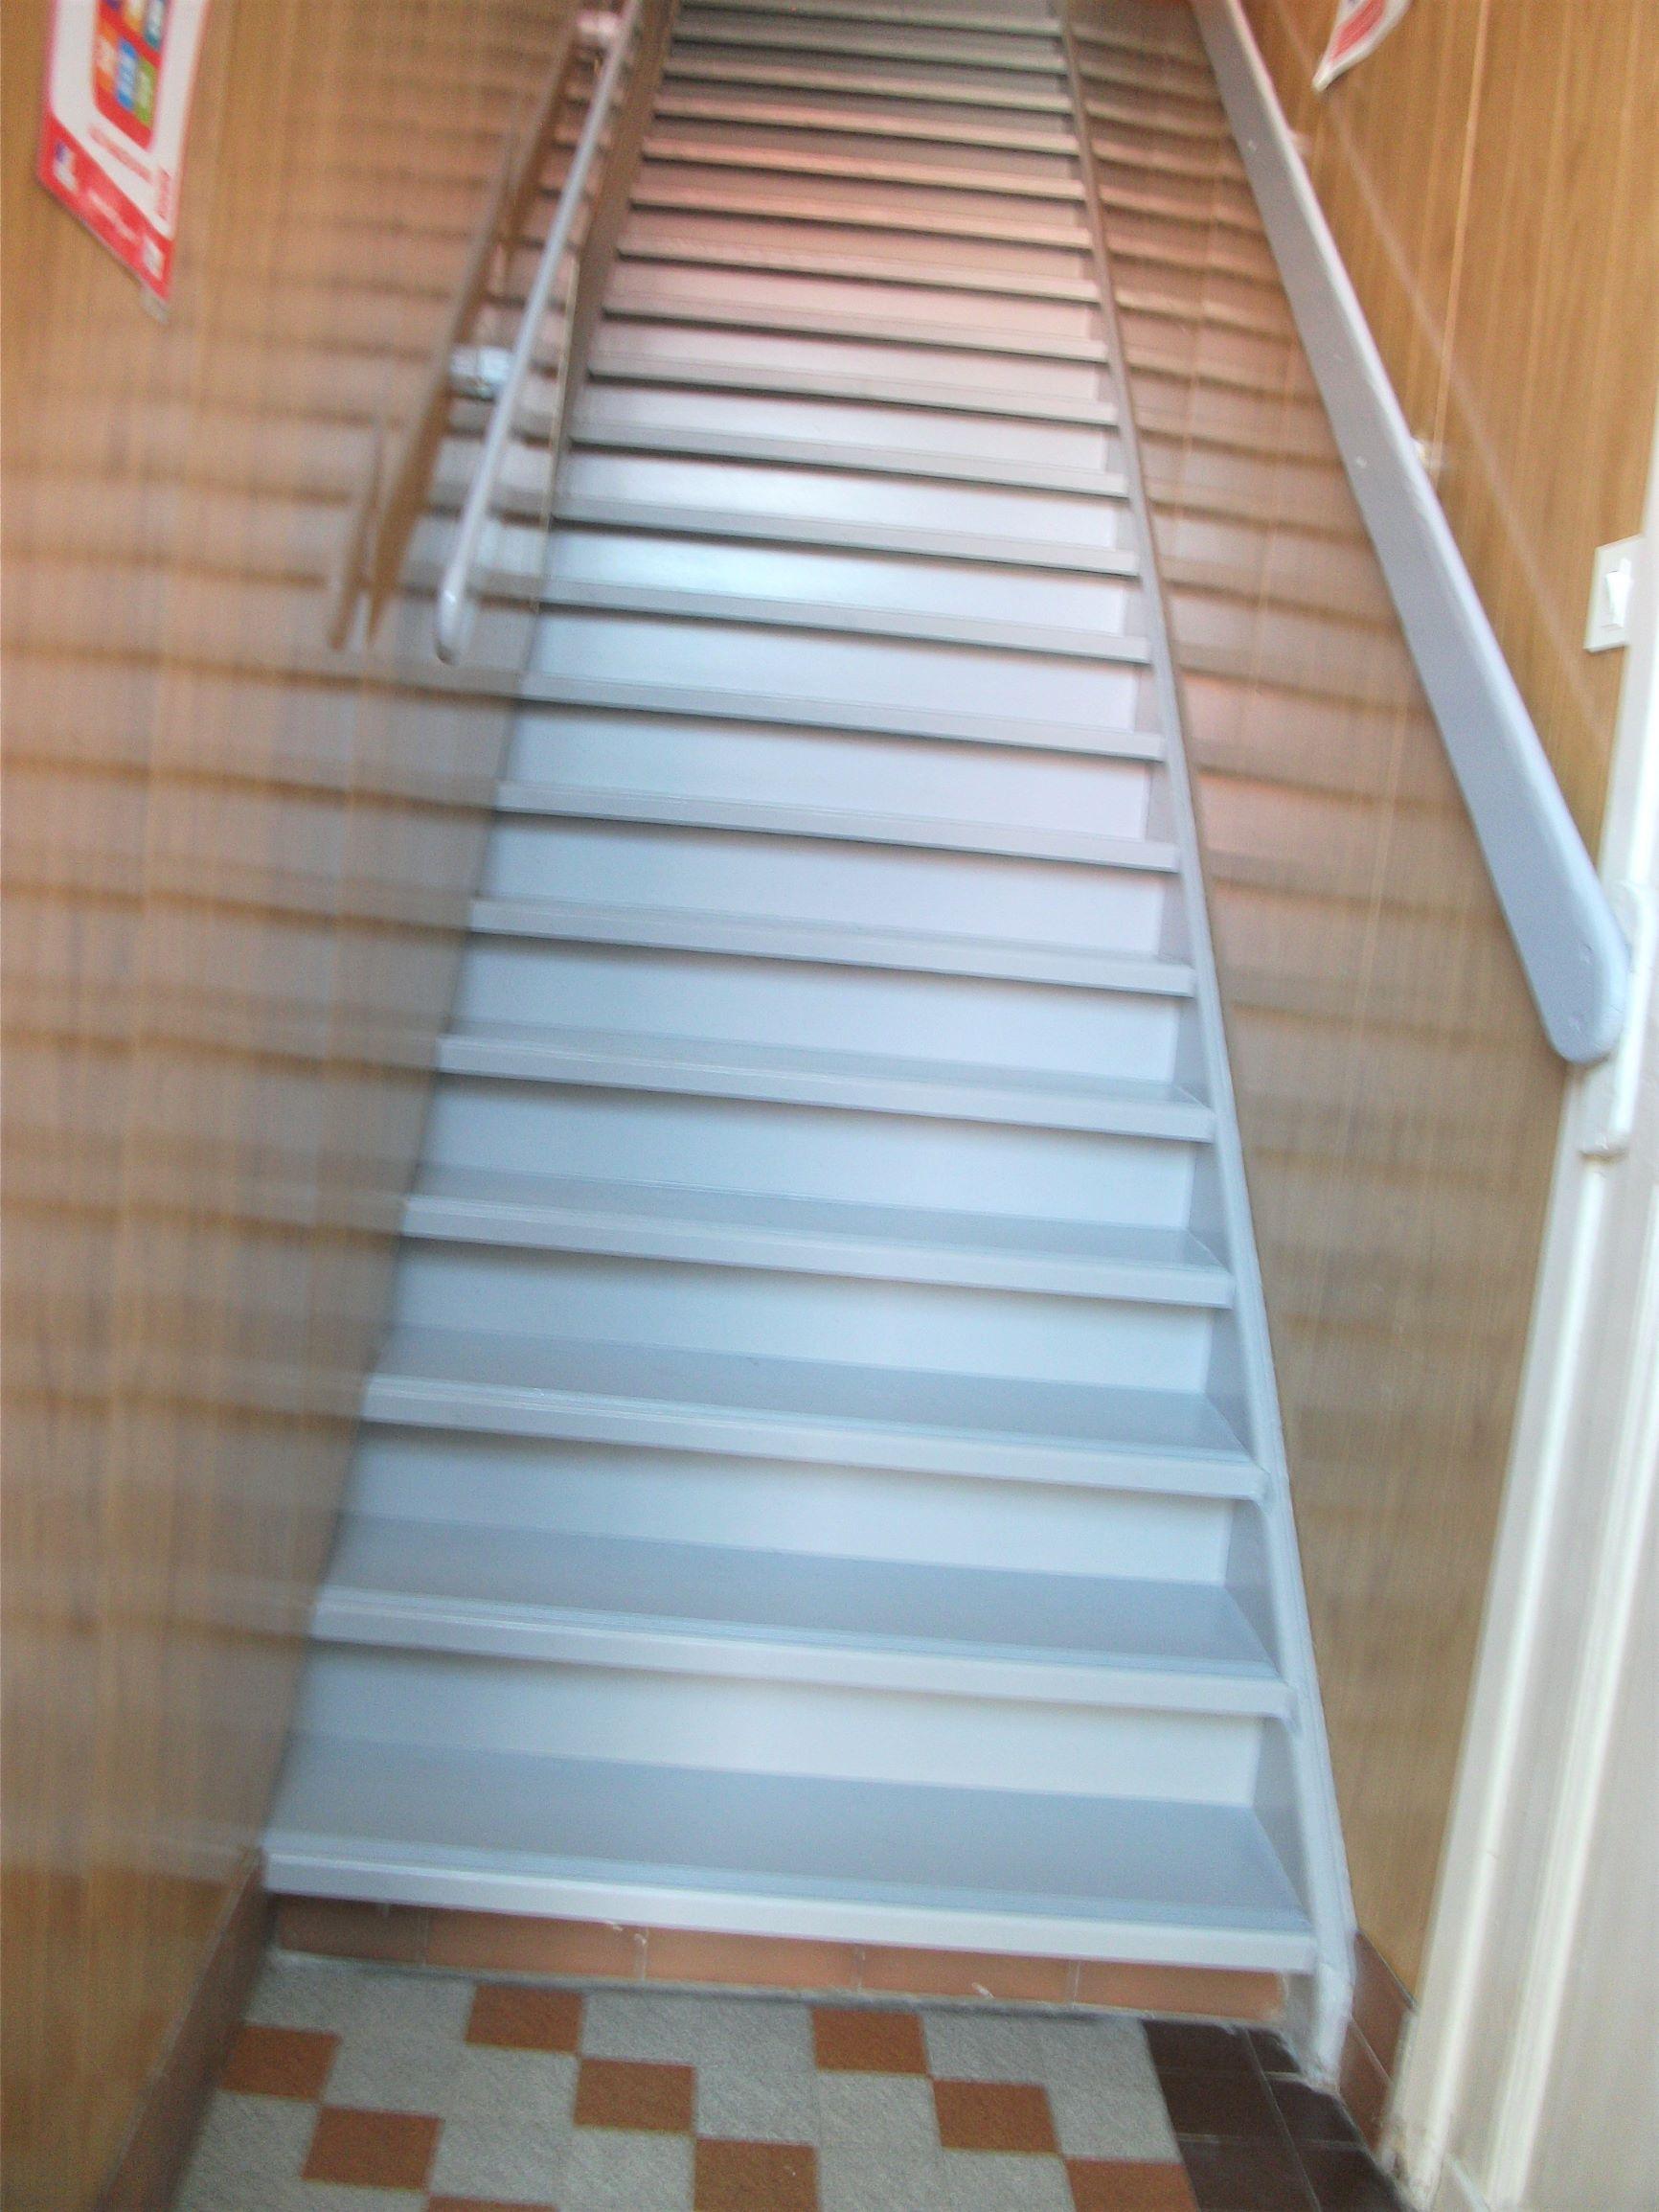 Ecole_MVDM_escalier_2.JPG